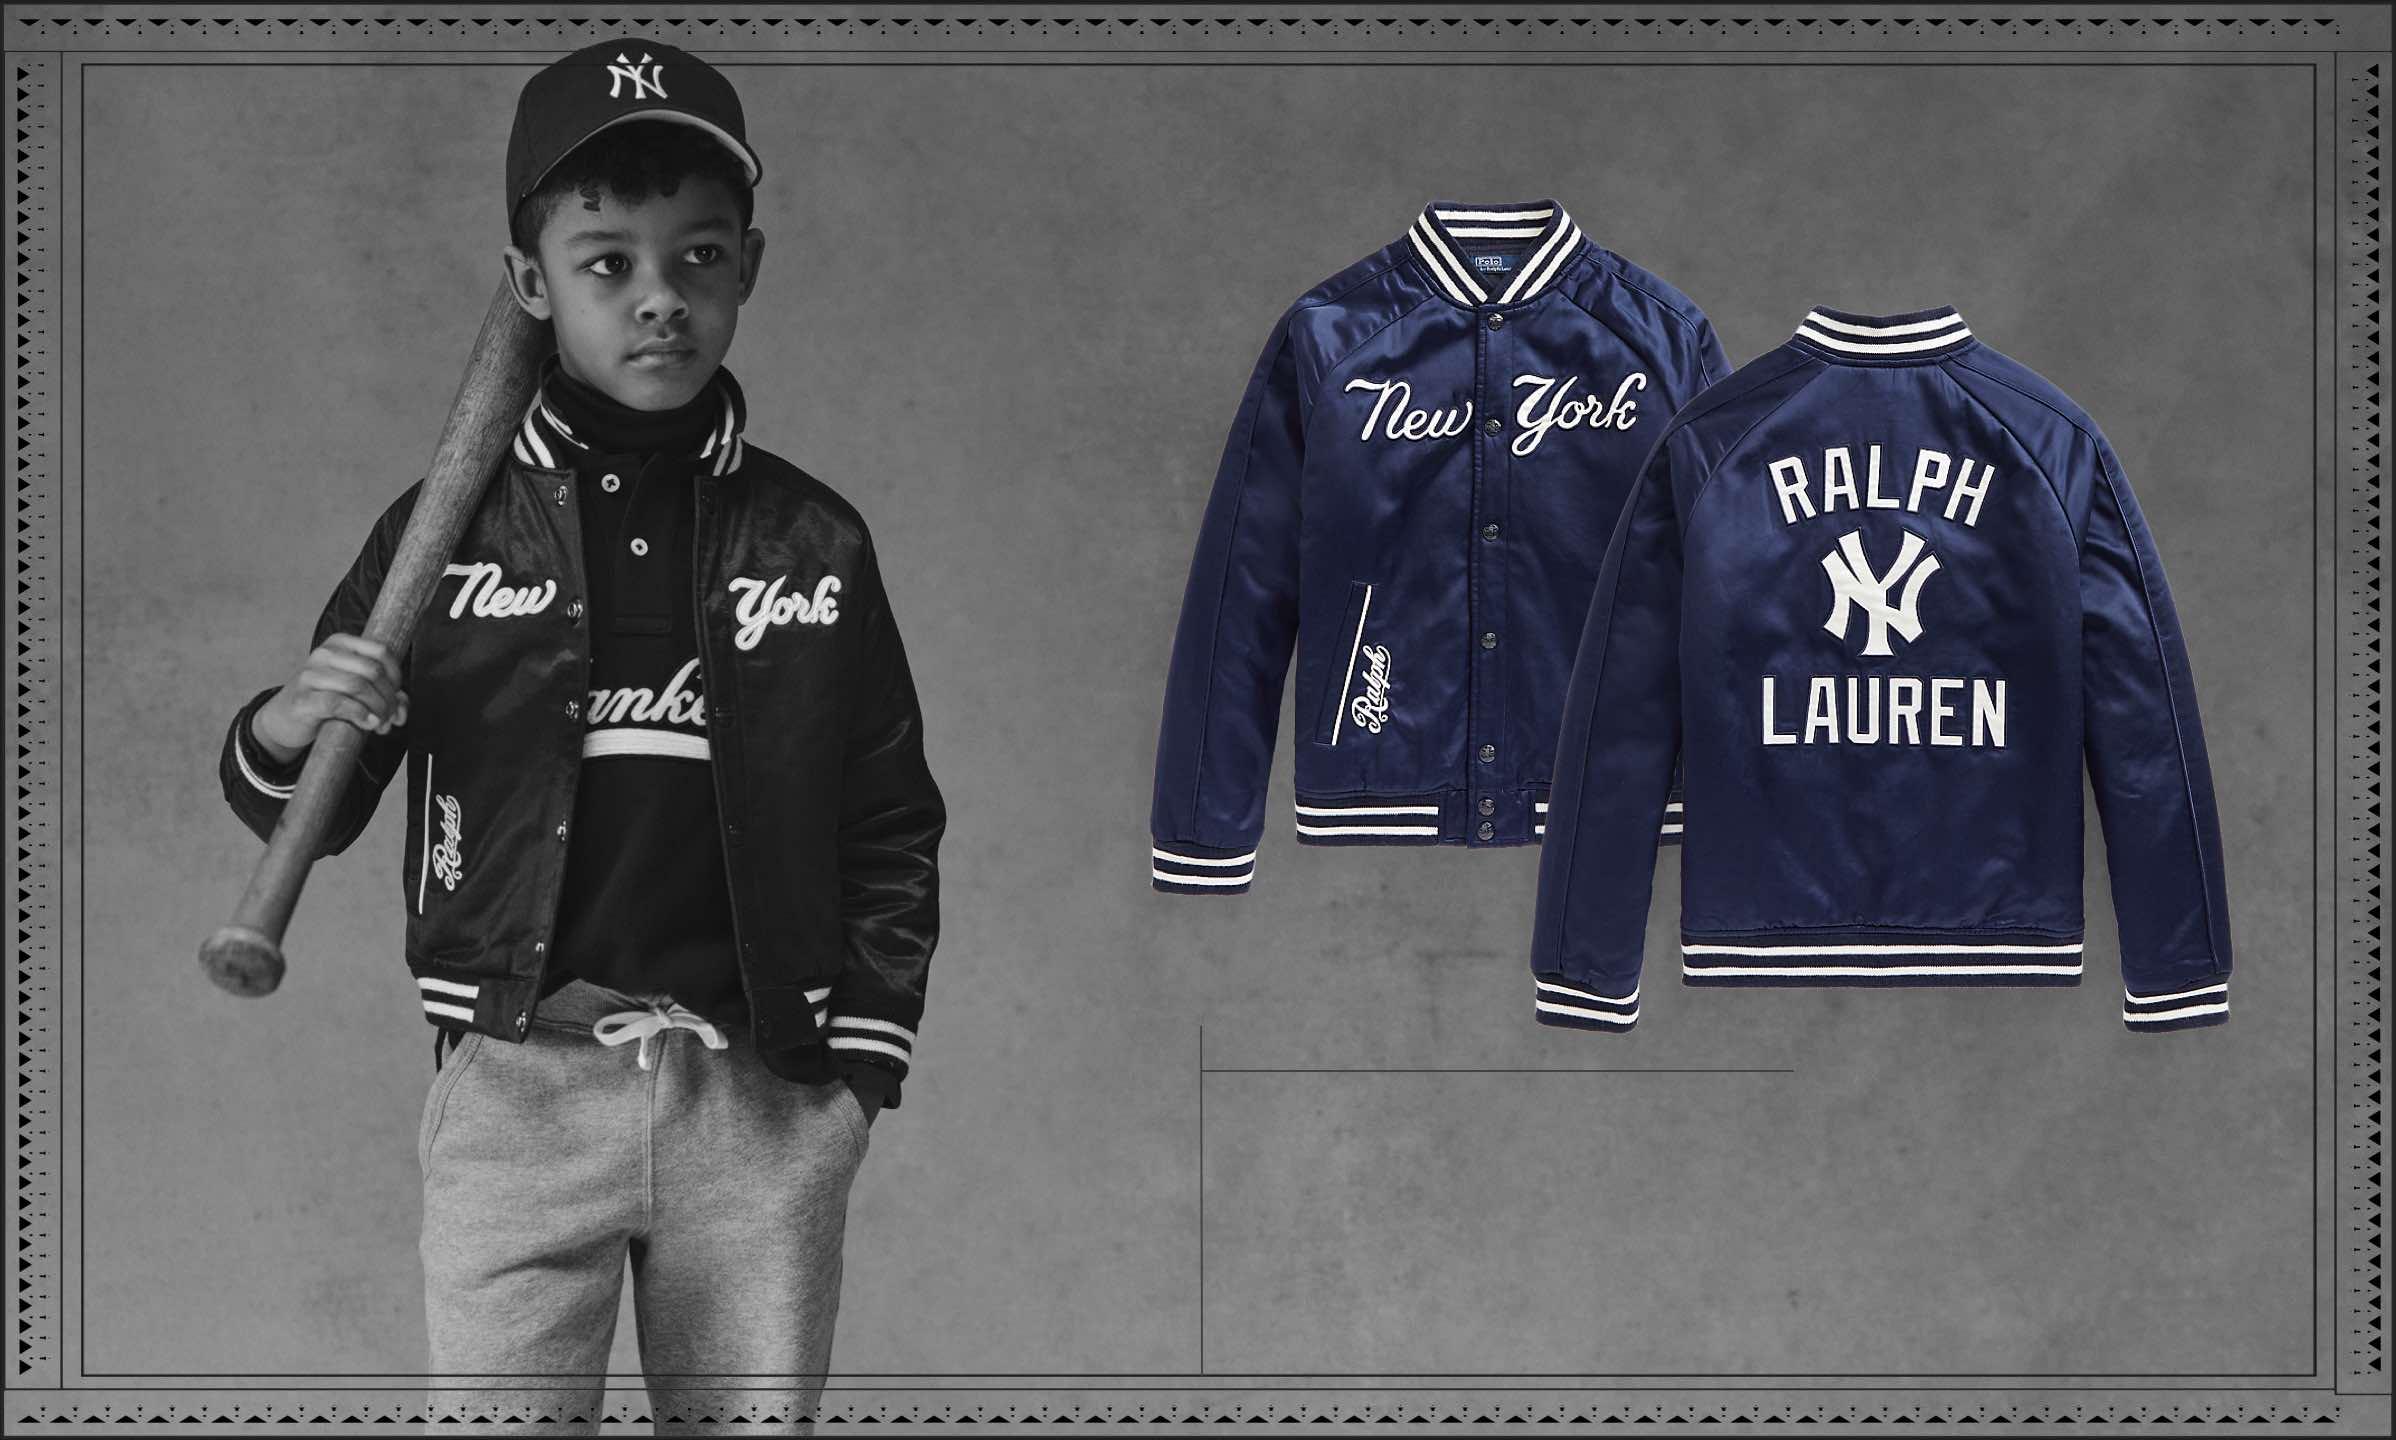 Greyscale photo of boy wearing the Polo Ralph Lauren Yankees™ Jacket